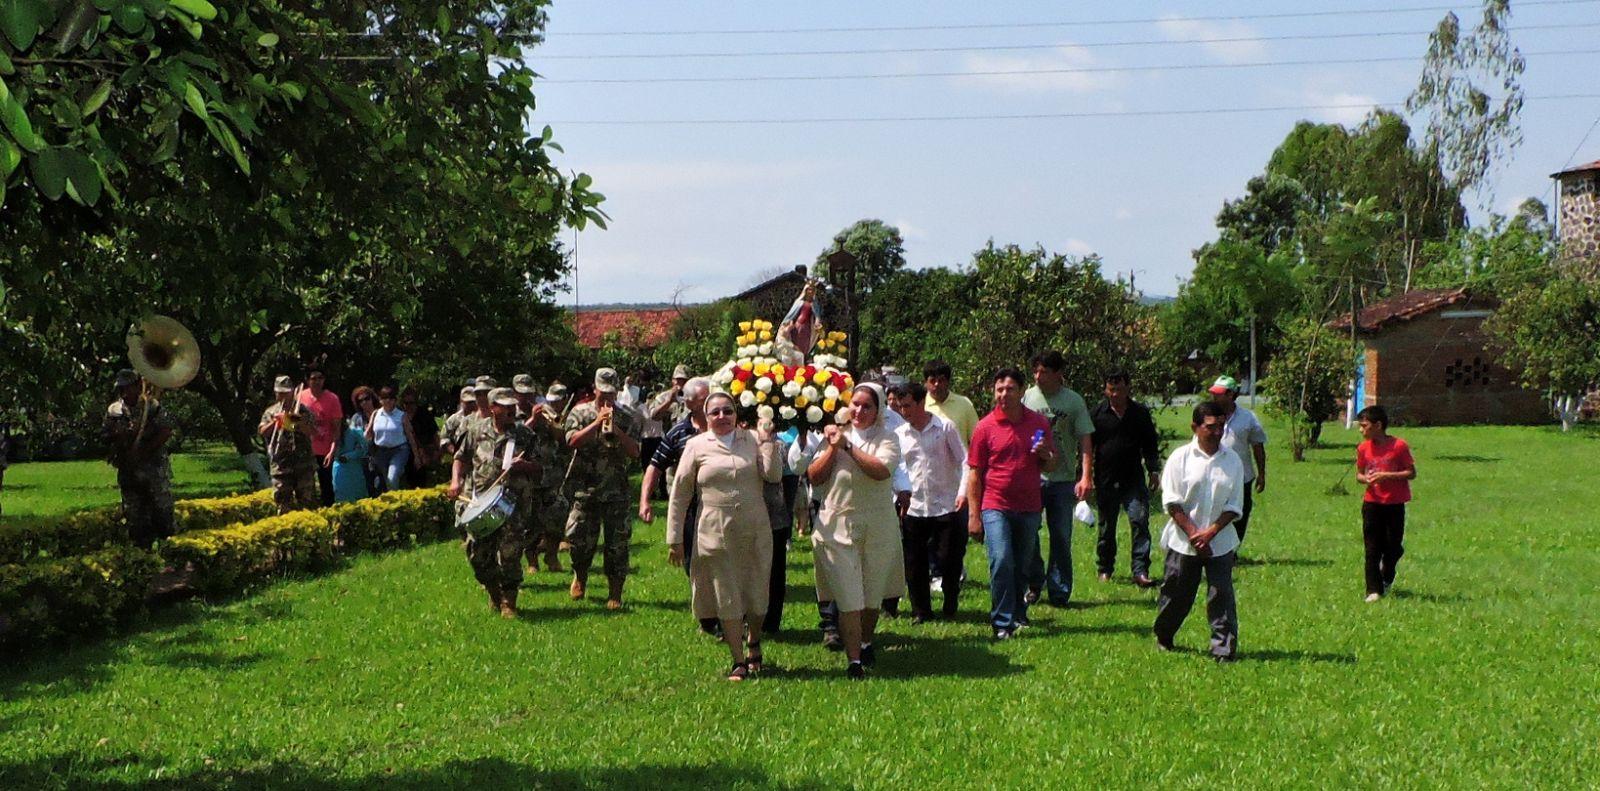 Festiva jornada en Leprocomio Santa Isabel de Sapucái